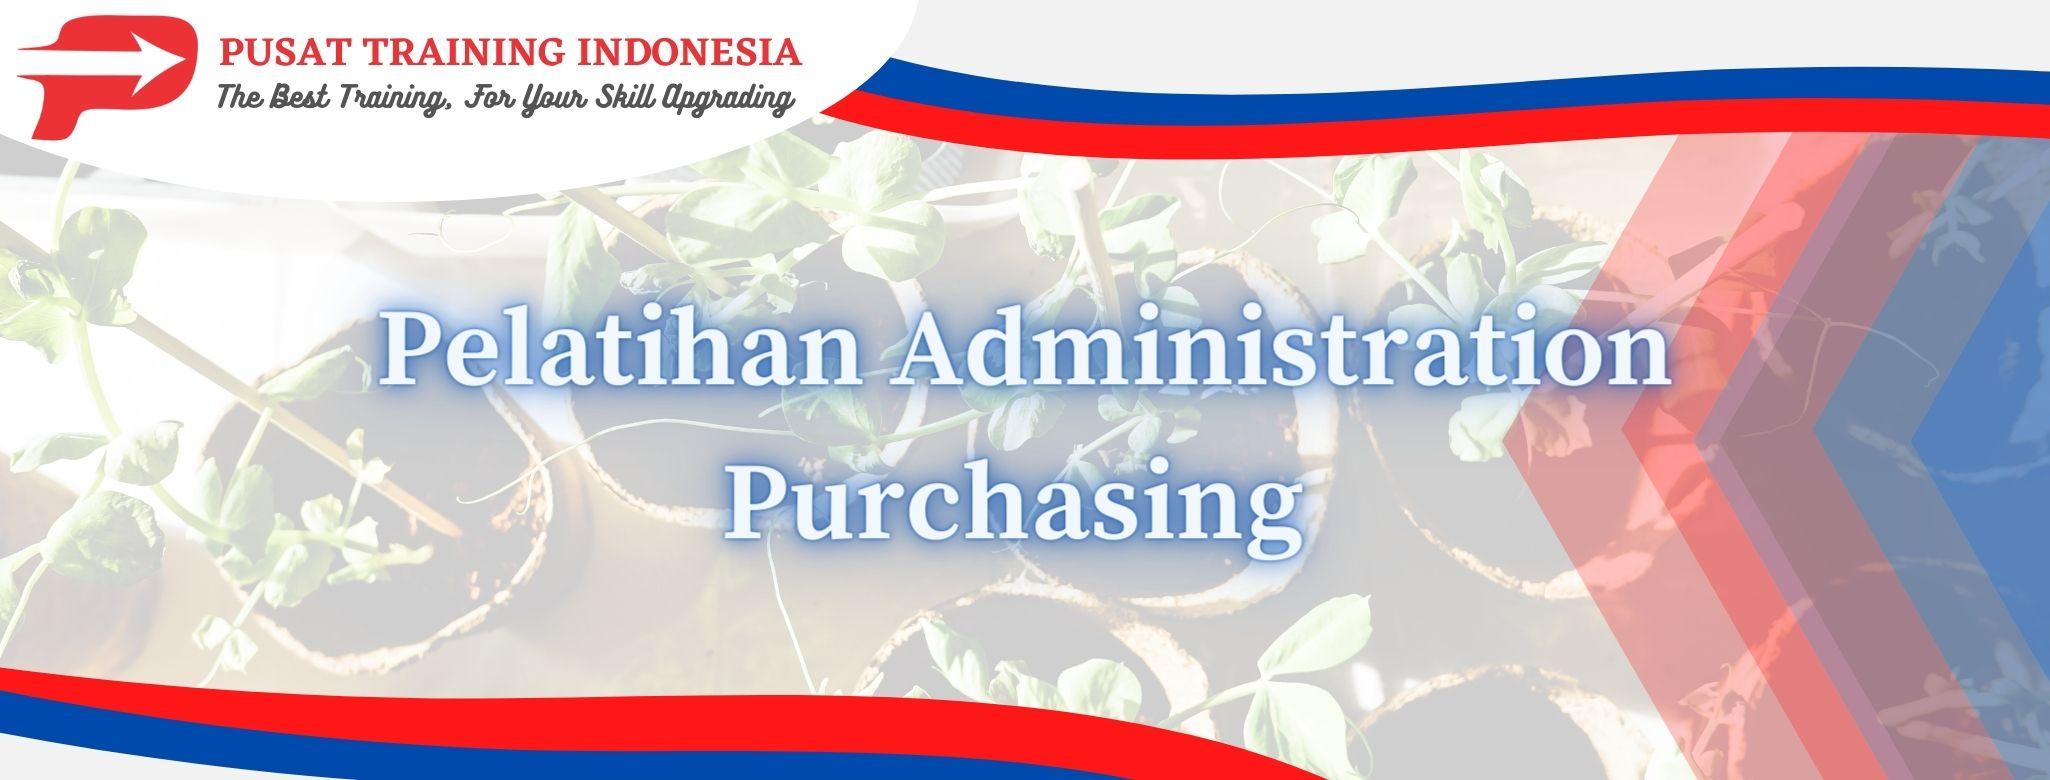 Pelatihan-Administration-Purchasing